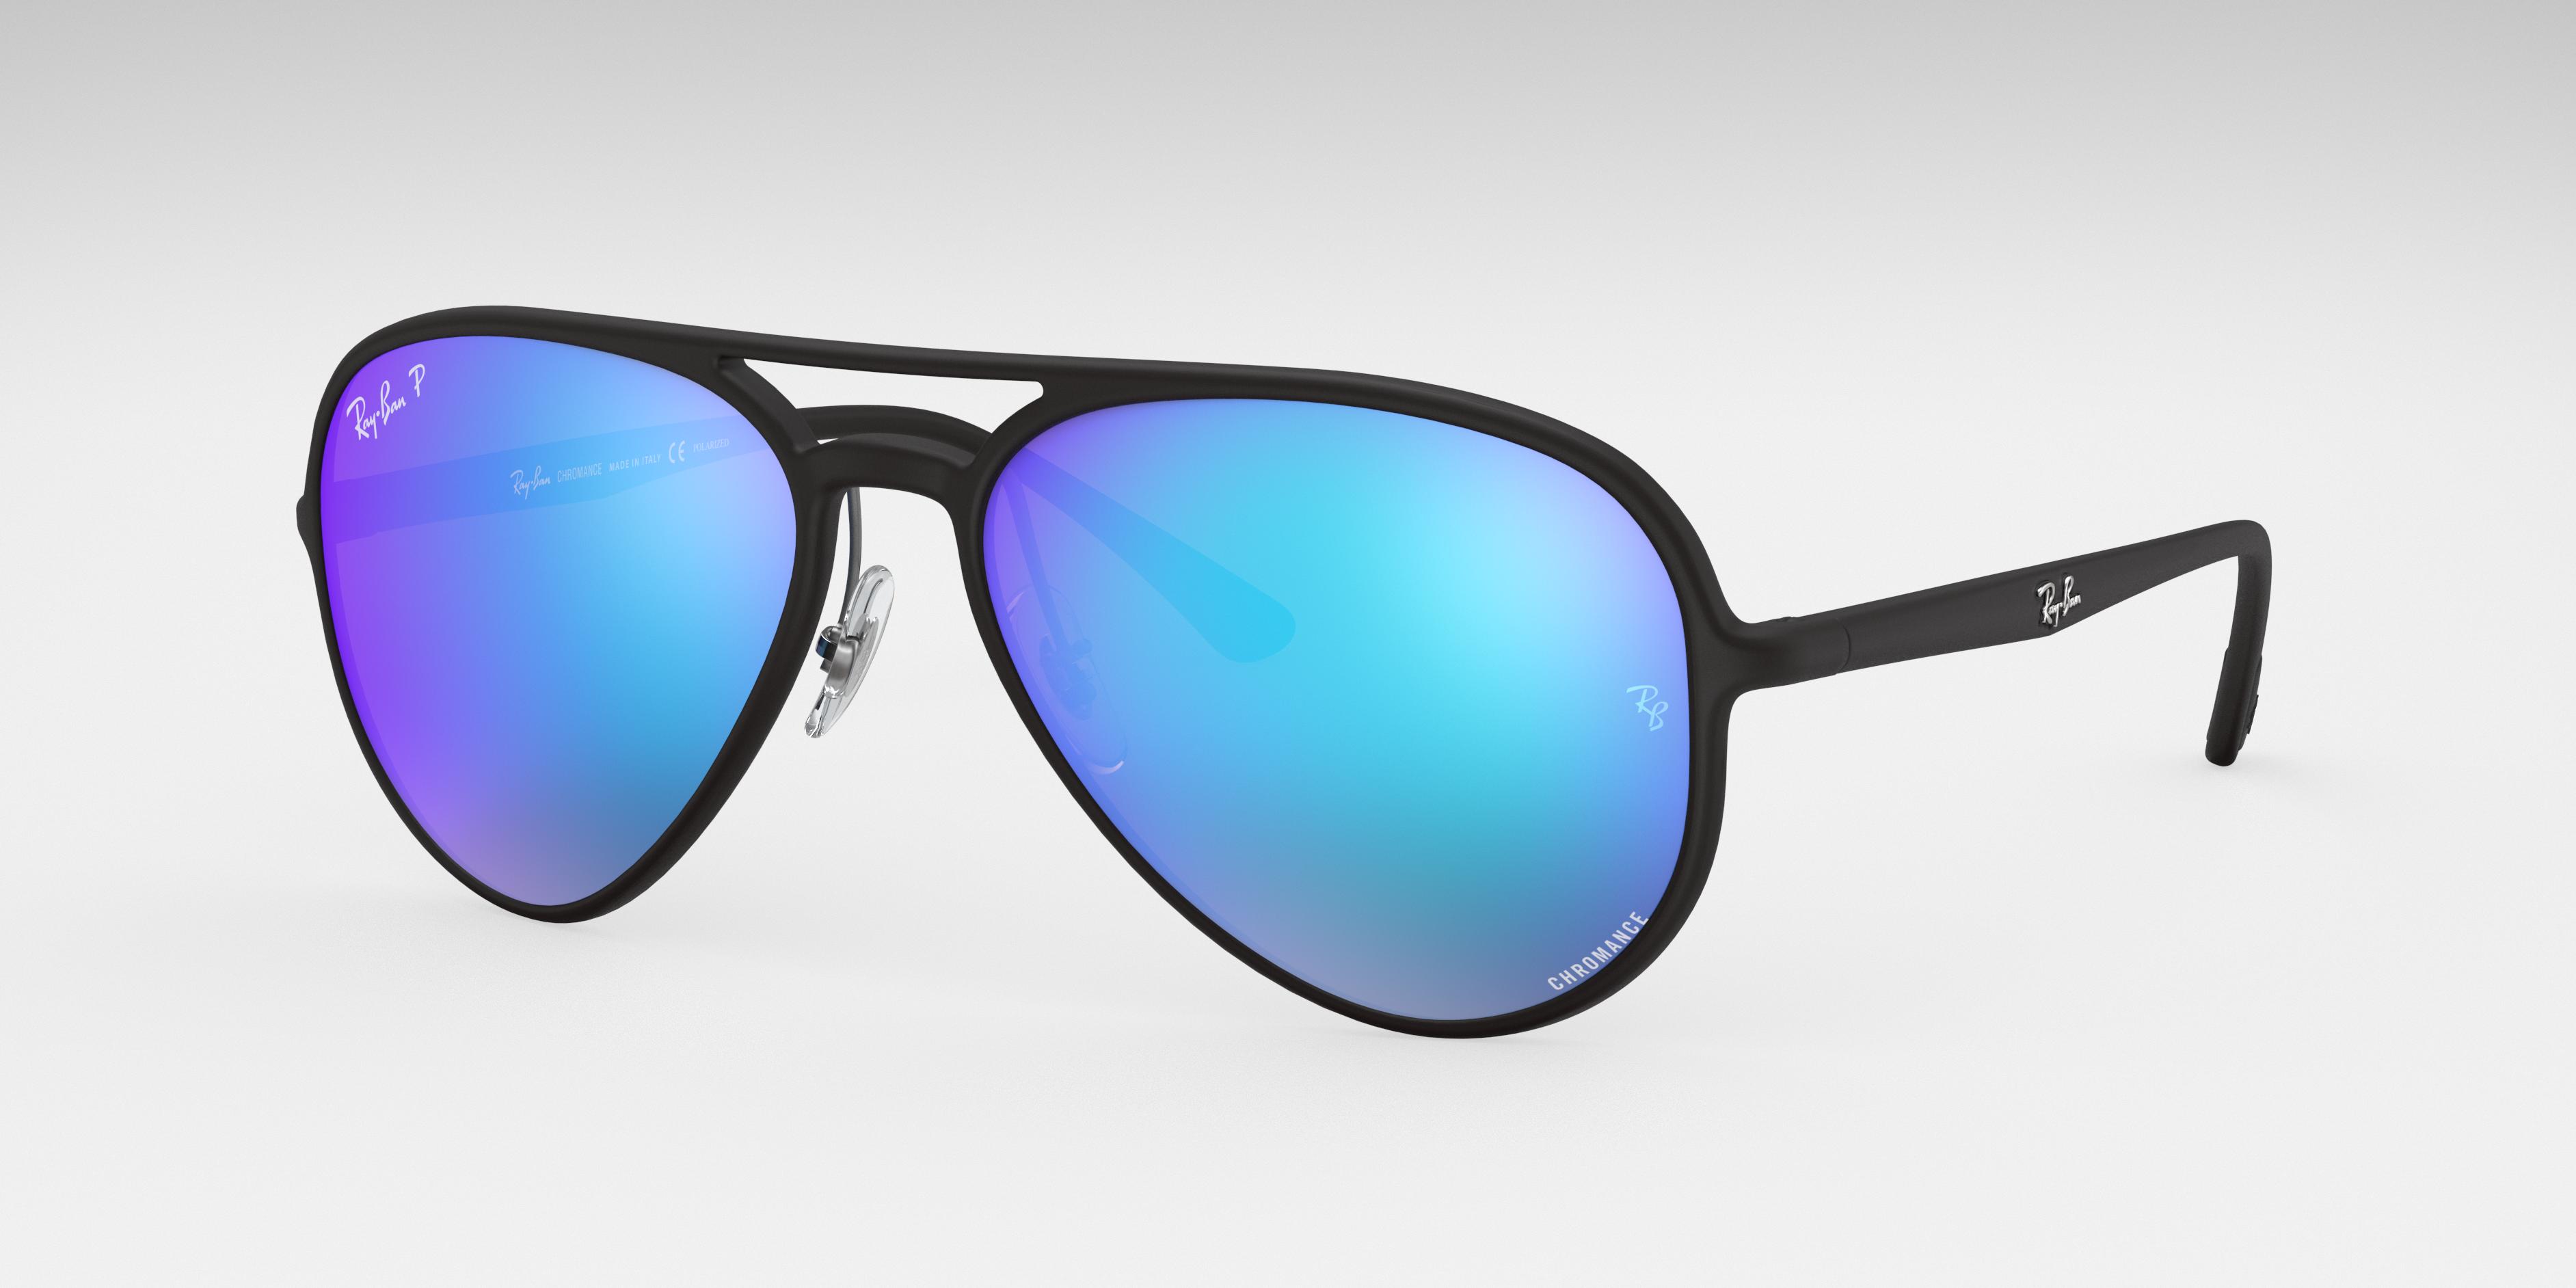 Ray-Ban Rb4320 Chromance Black, Polarized Blue Lenses - RB4320CH